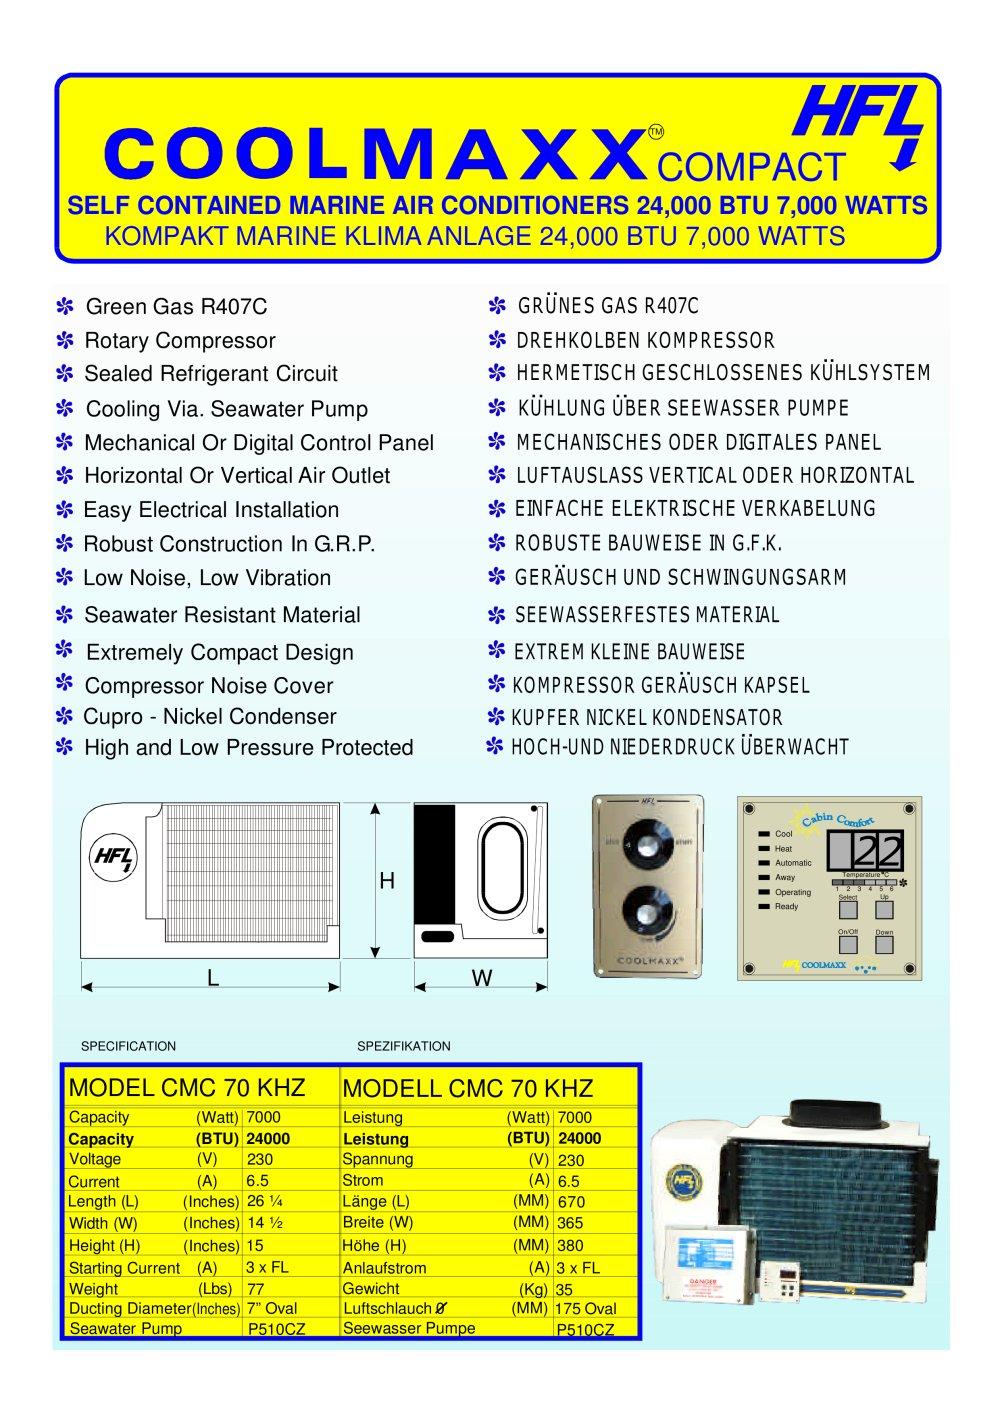 COOLMAX COMPACT 24 - HFL Power & Air GmbH - PDF Catalogues ...